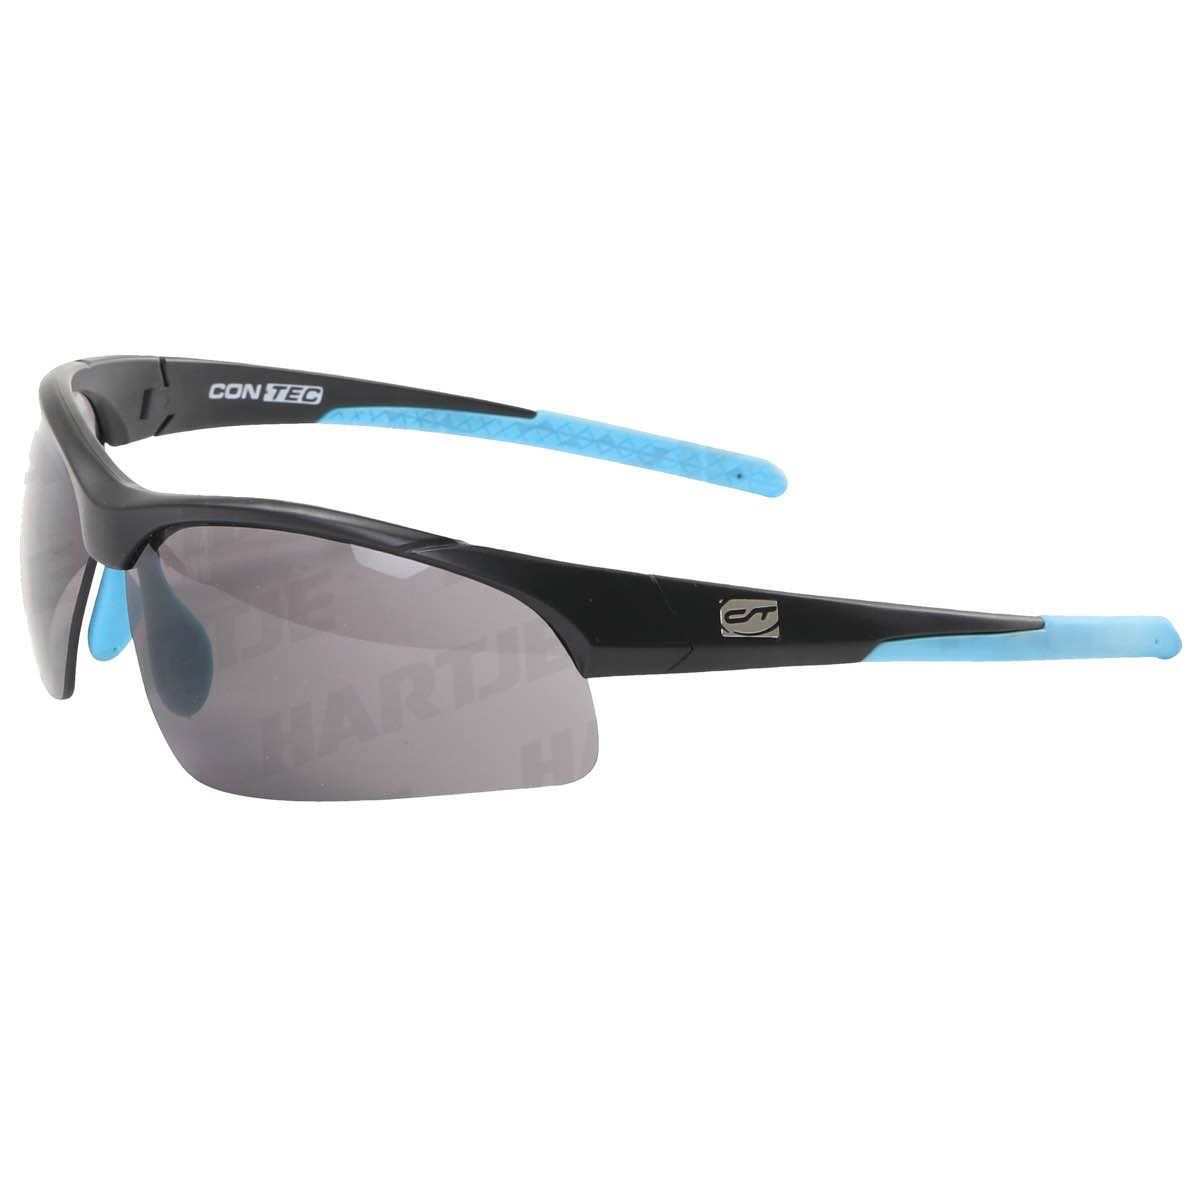 Cykelbrille Contec 3DIM Sort/Blå - 08049116 | Glasses